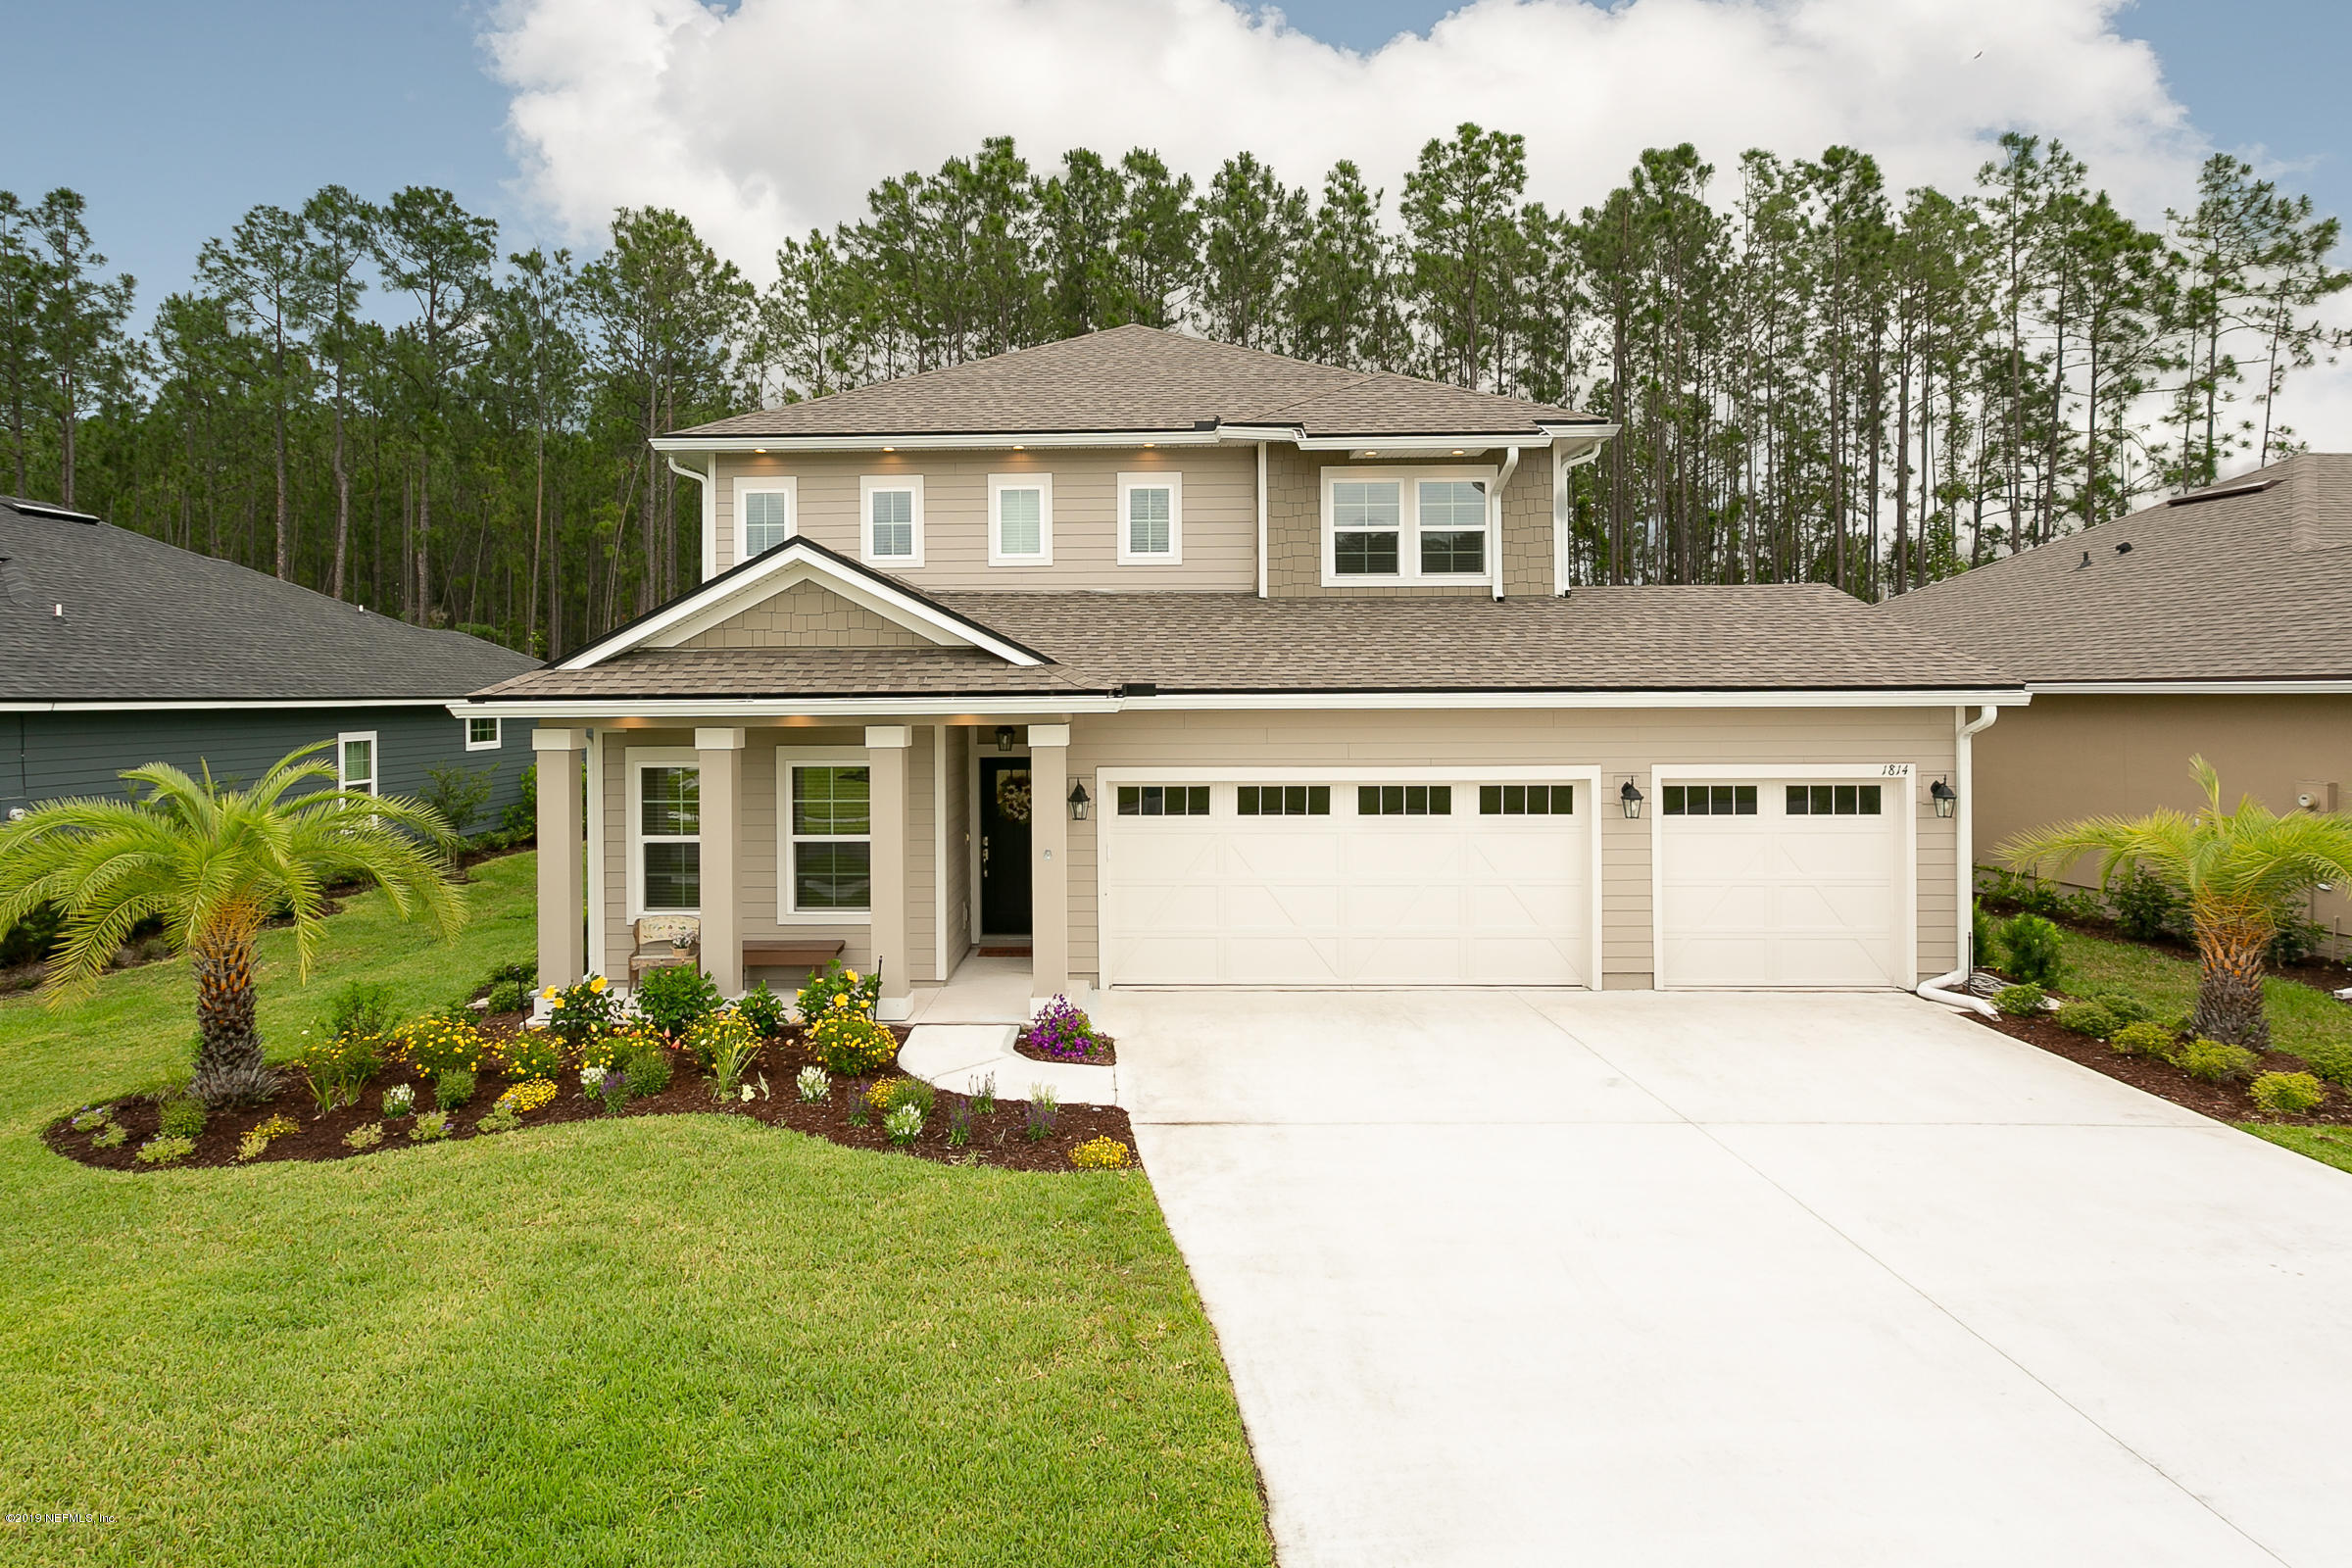 1814 ADLER NEST, FLEMING ISLAND, FLORIDA 32003, 4 Bedrooms Bedrooms, ,3 BathroomsBathrooms,Residential - single family,For sale,ADLER NEST,995325